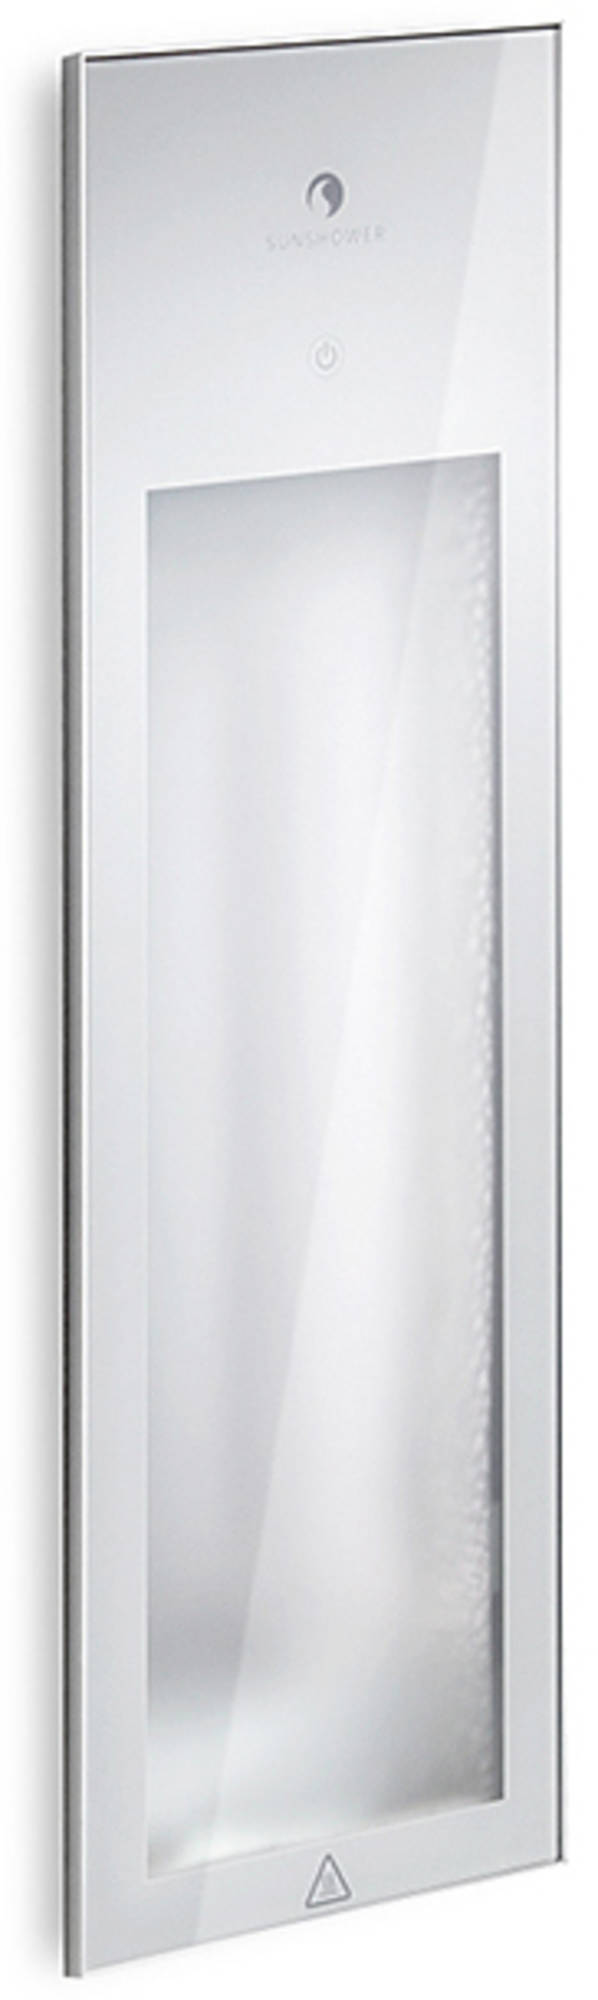 Productafbeelding van Sunshower Pure 2.0 White Infrarood Inbouwapparaat 19.9x61.9x10 cm Half Body Pure White